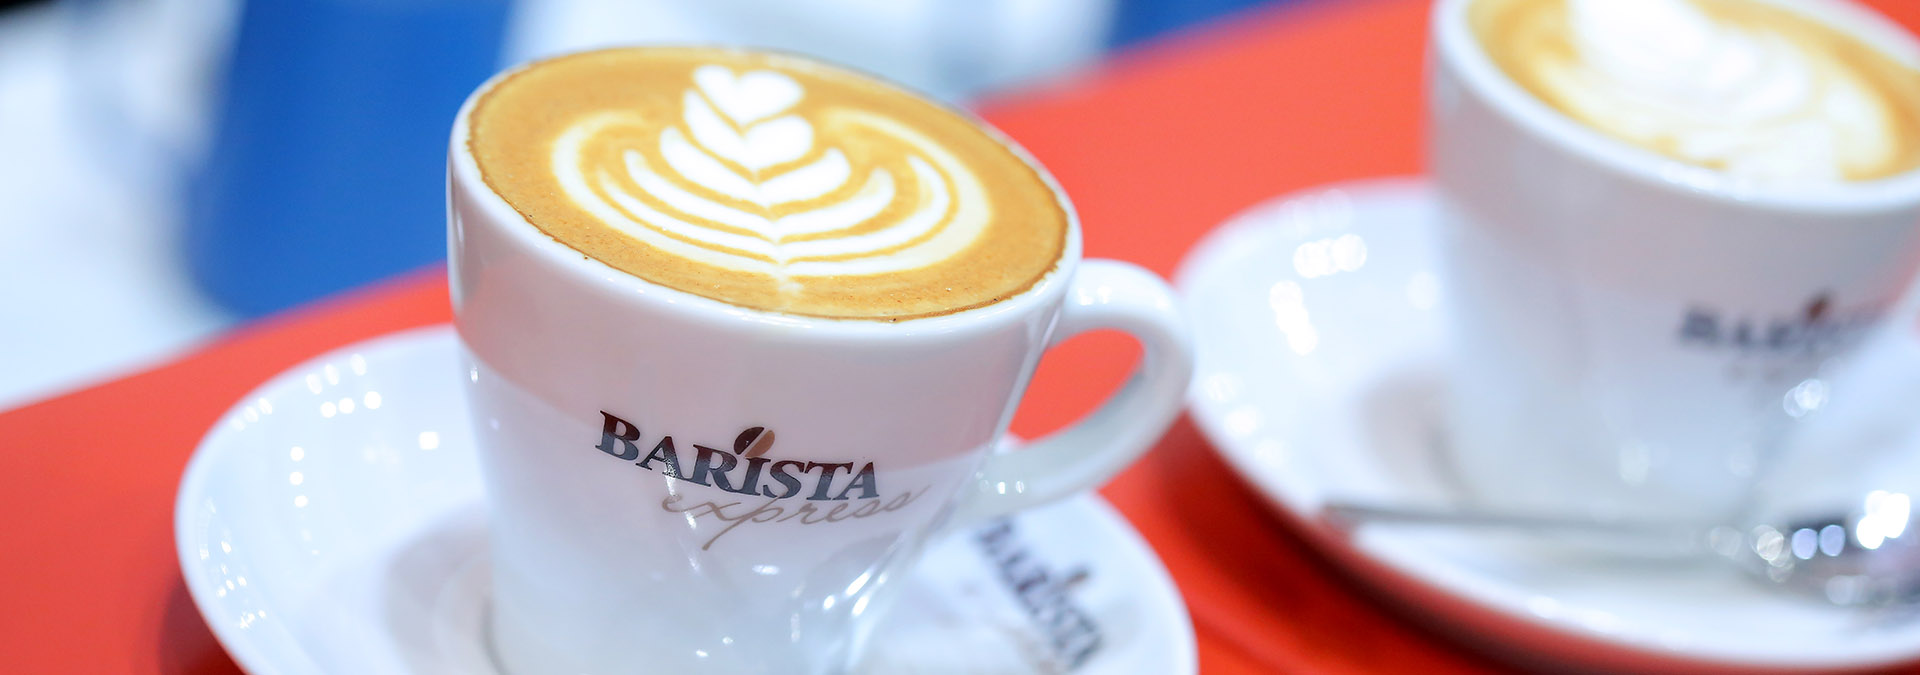 Barista Express - Barista-Service / Kaffeecatering & Smoothies auf ...